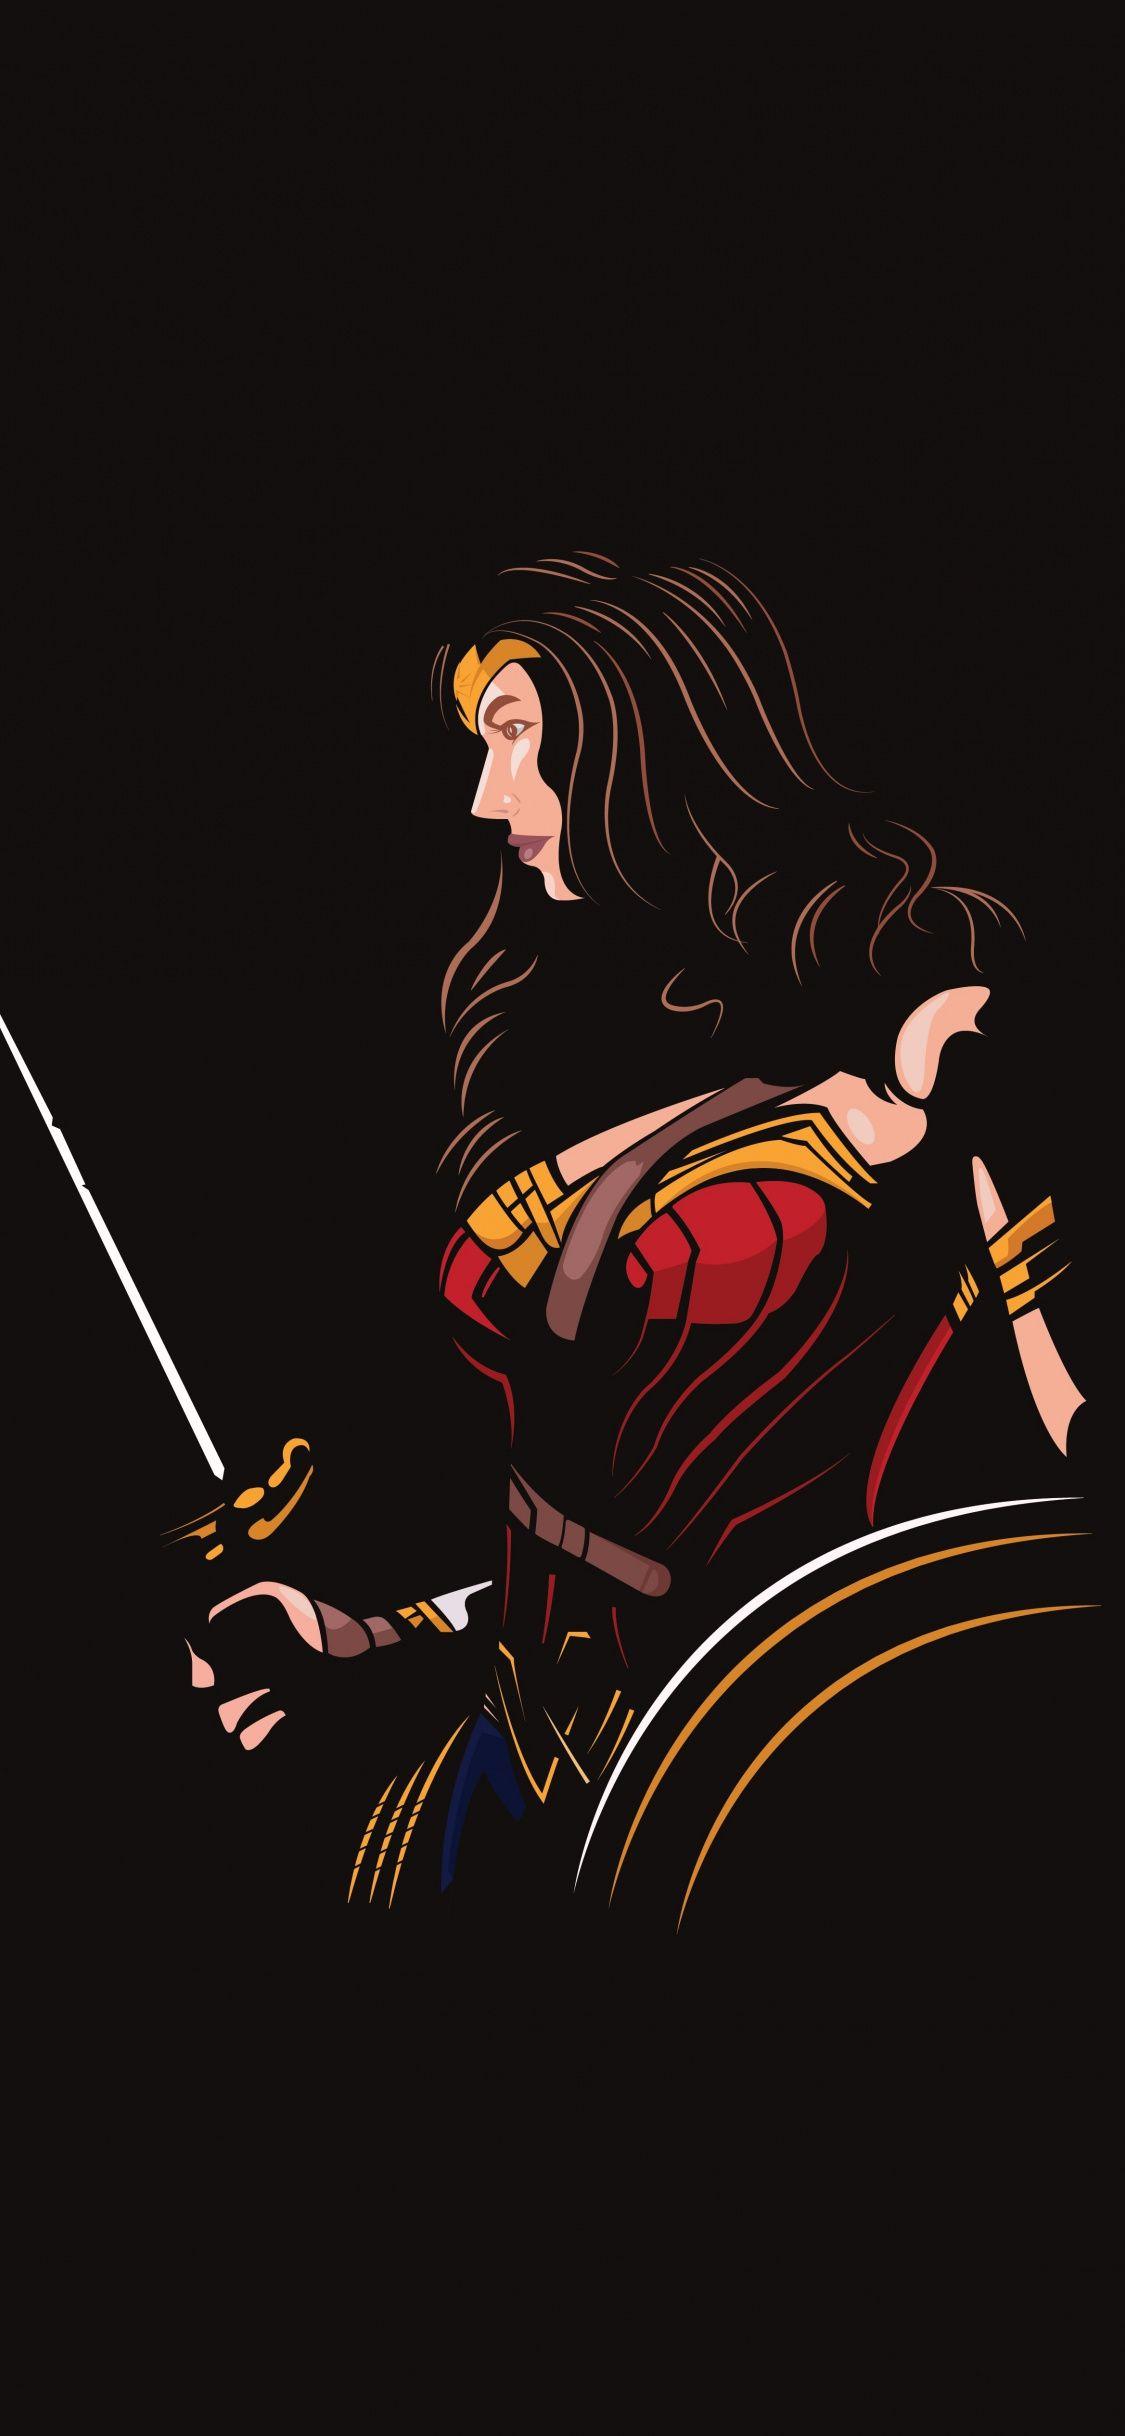 Wonder Woman Minimal Dc Comics Superhero Art 1125x2436